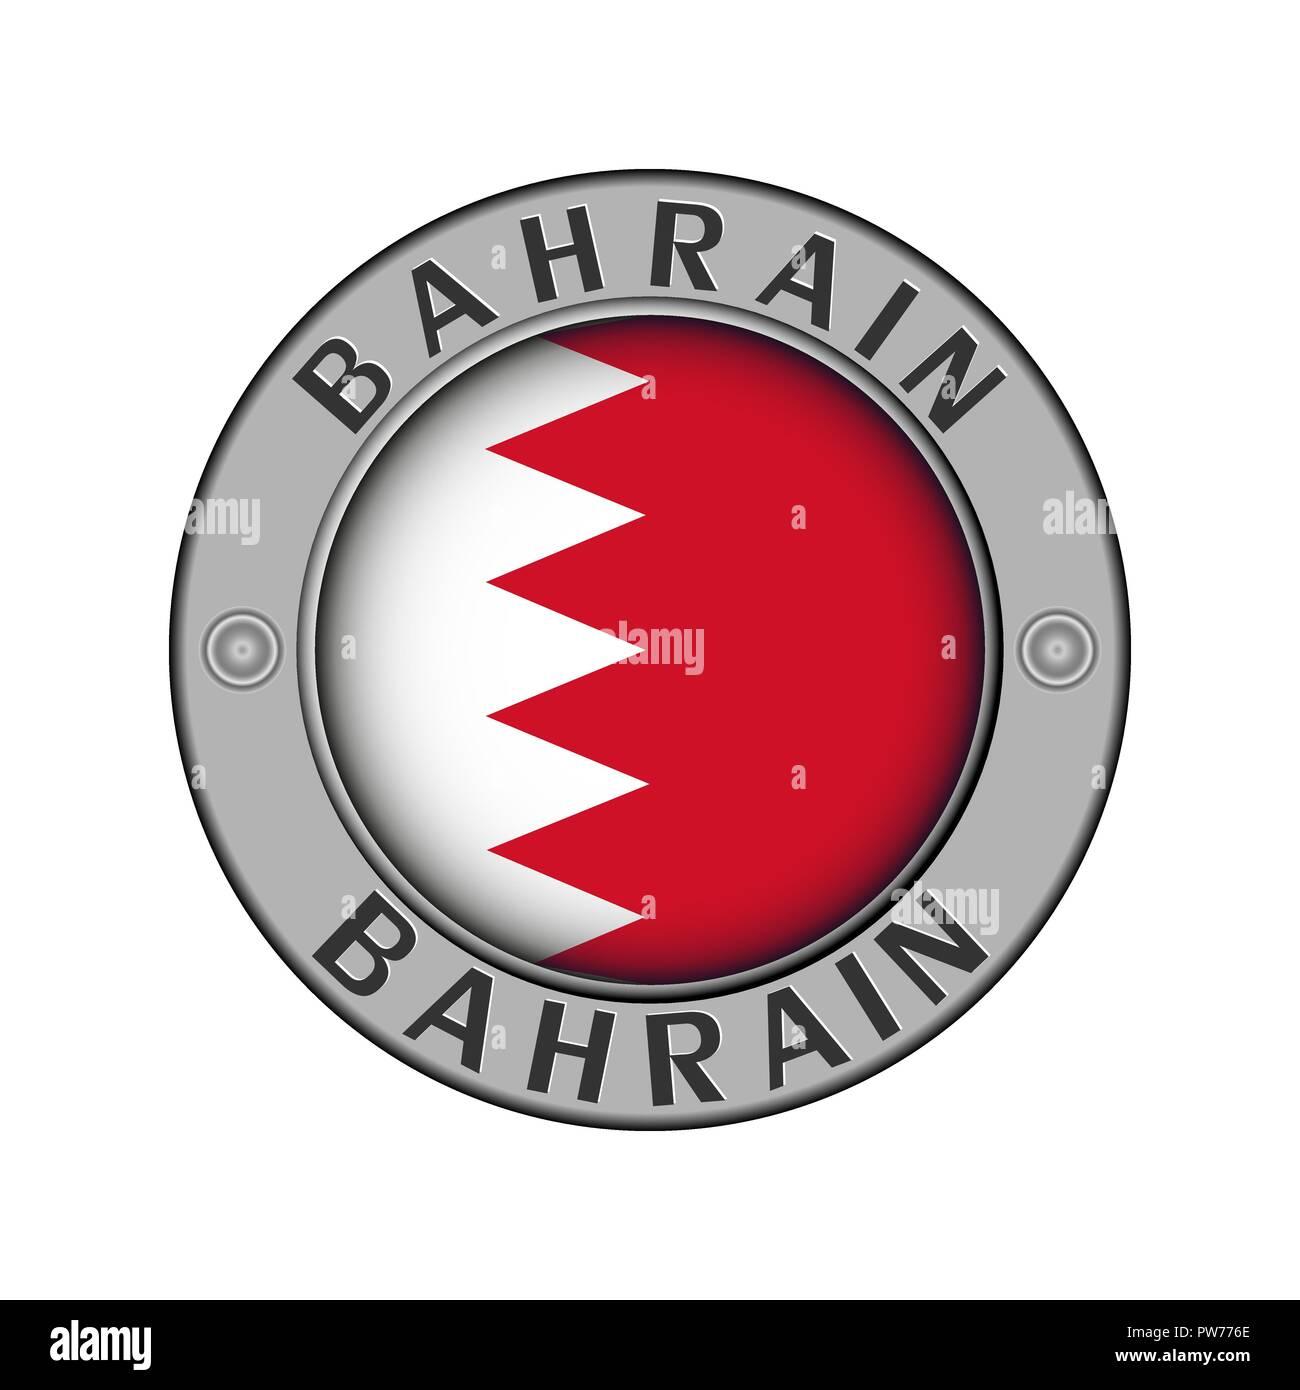 "Image result for Bahrain name"""